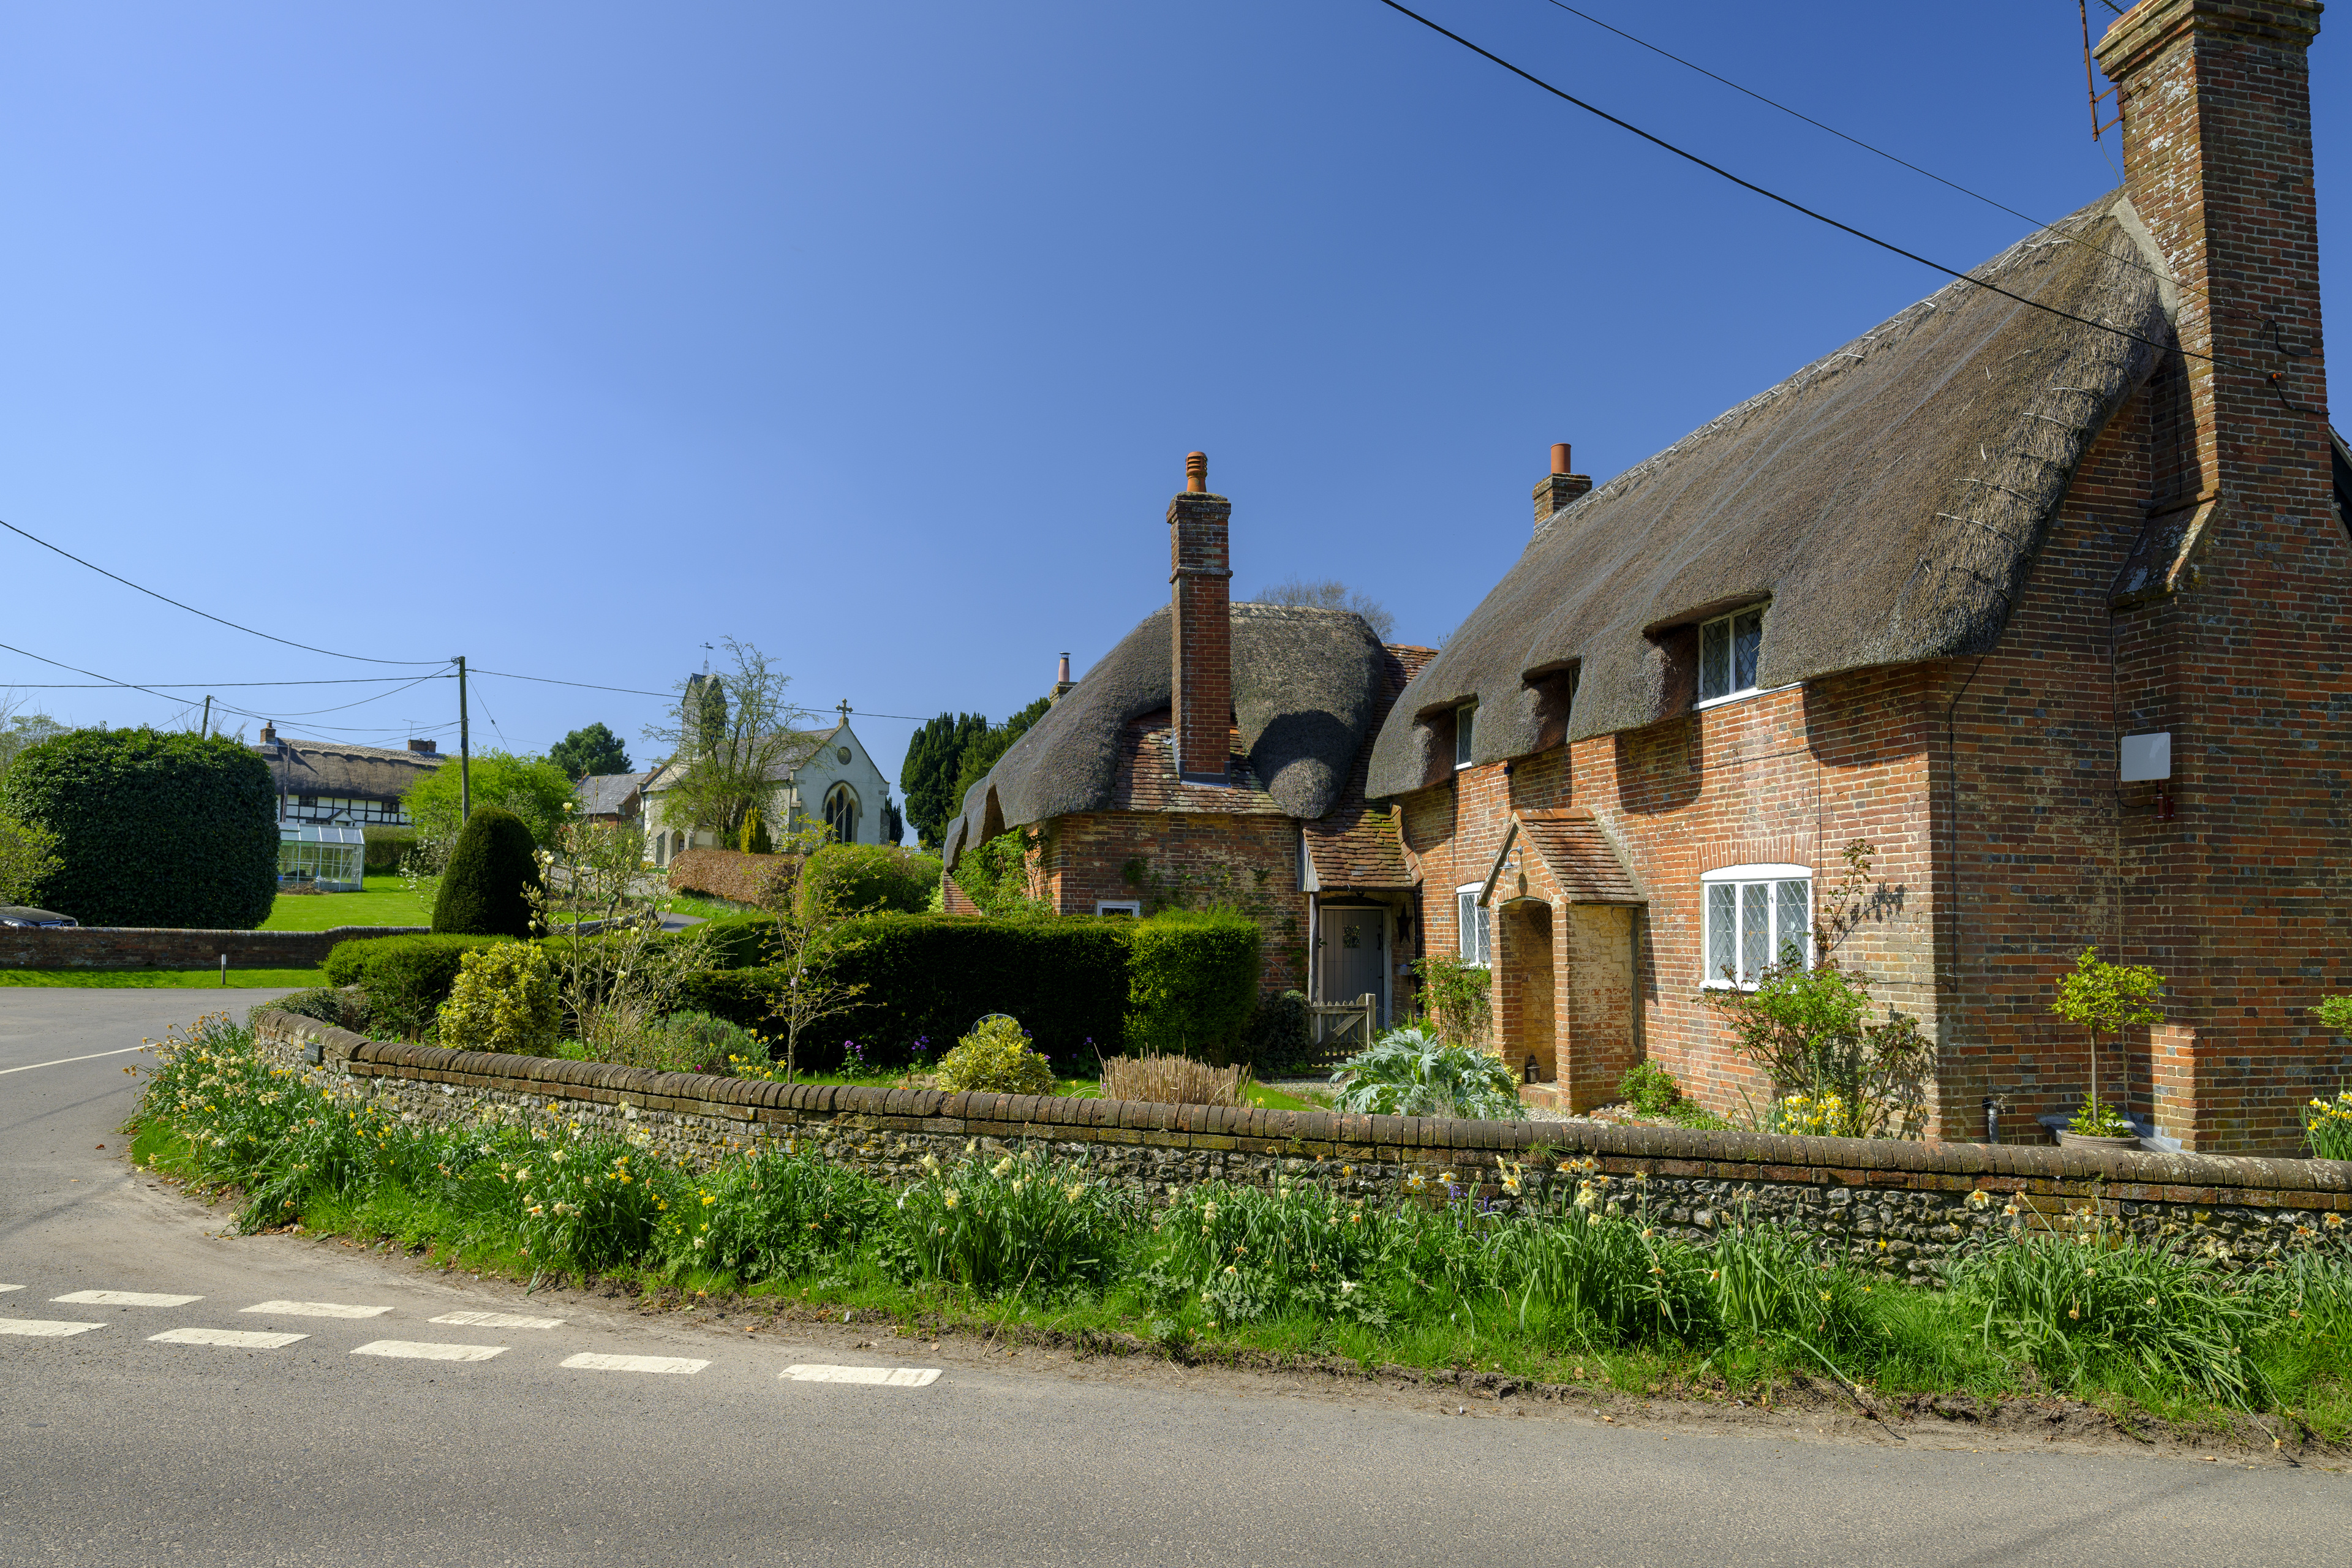 Afternoon spring sunshine in Beauworth Village, Hampshire, UK